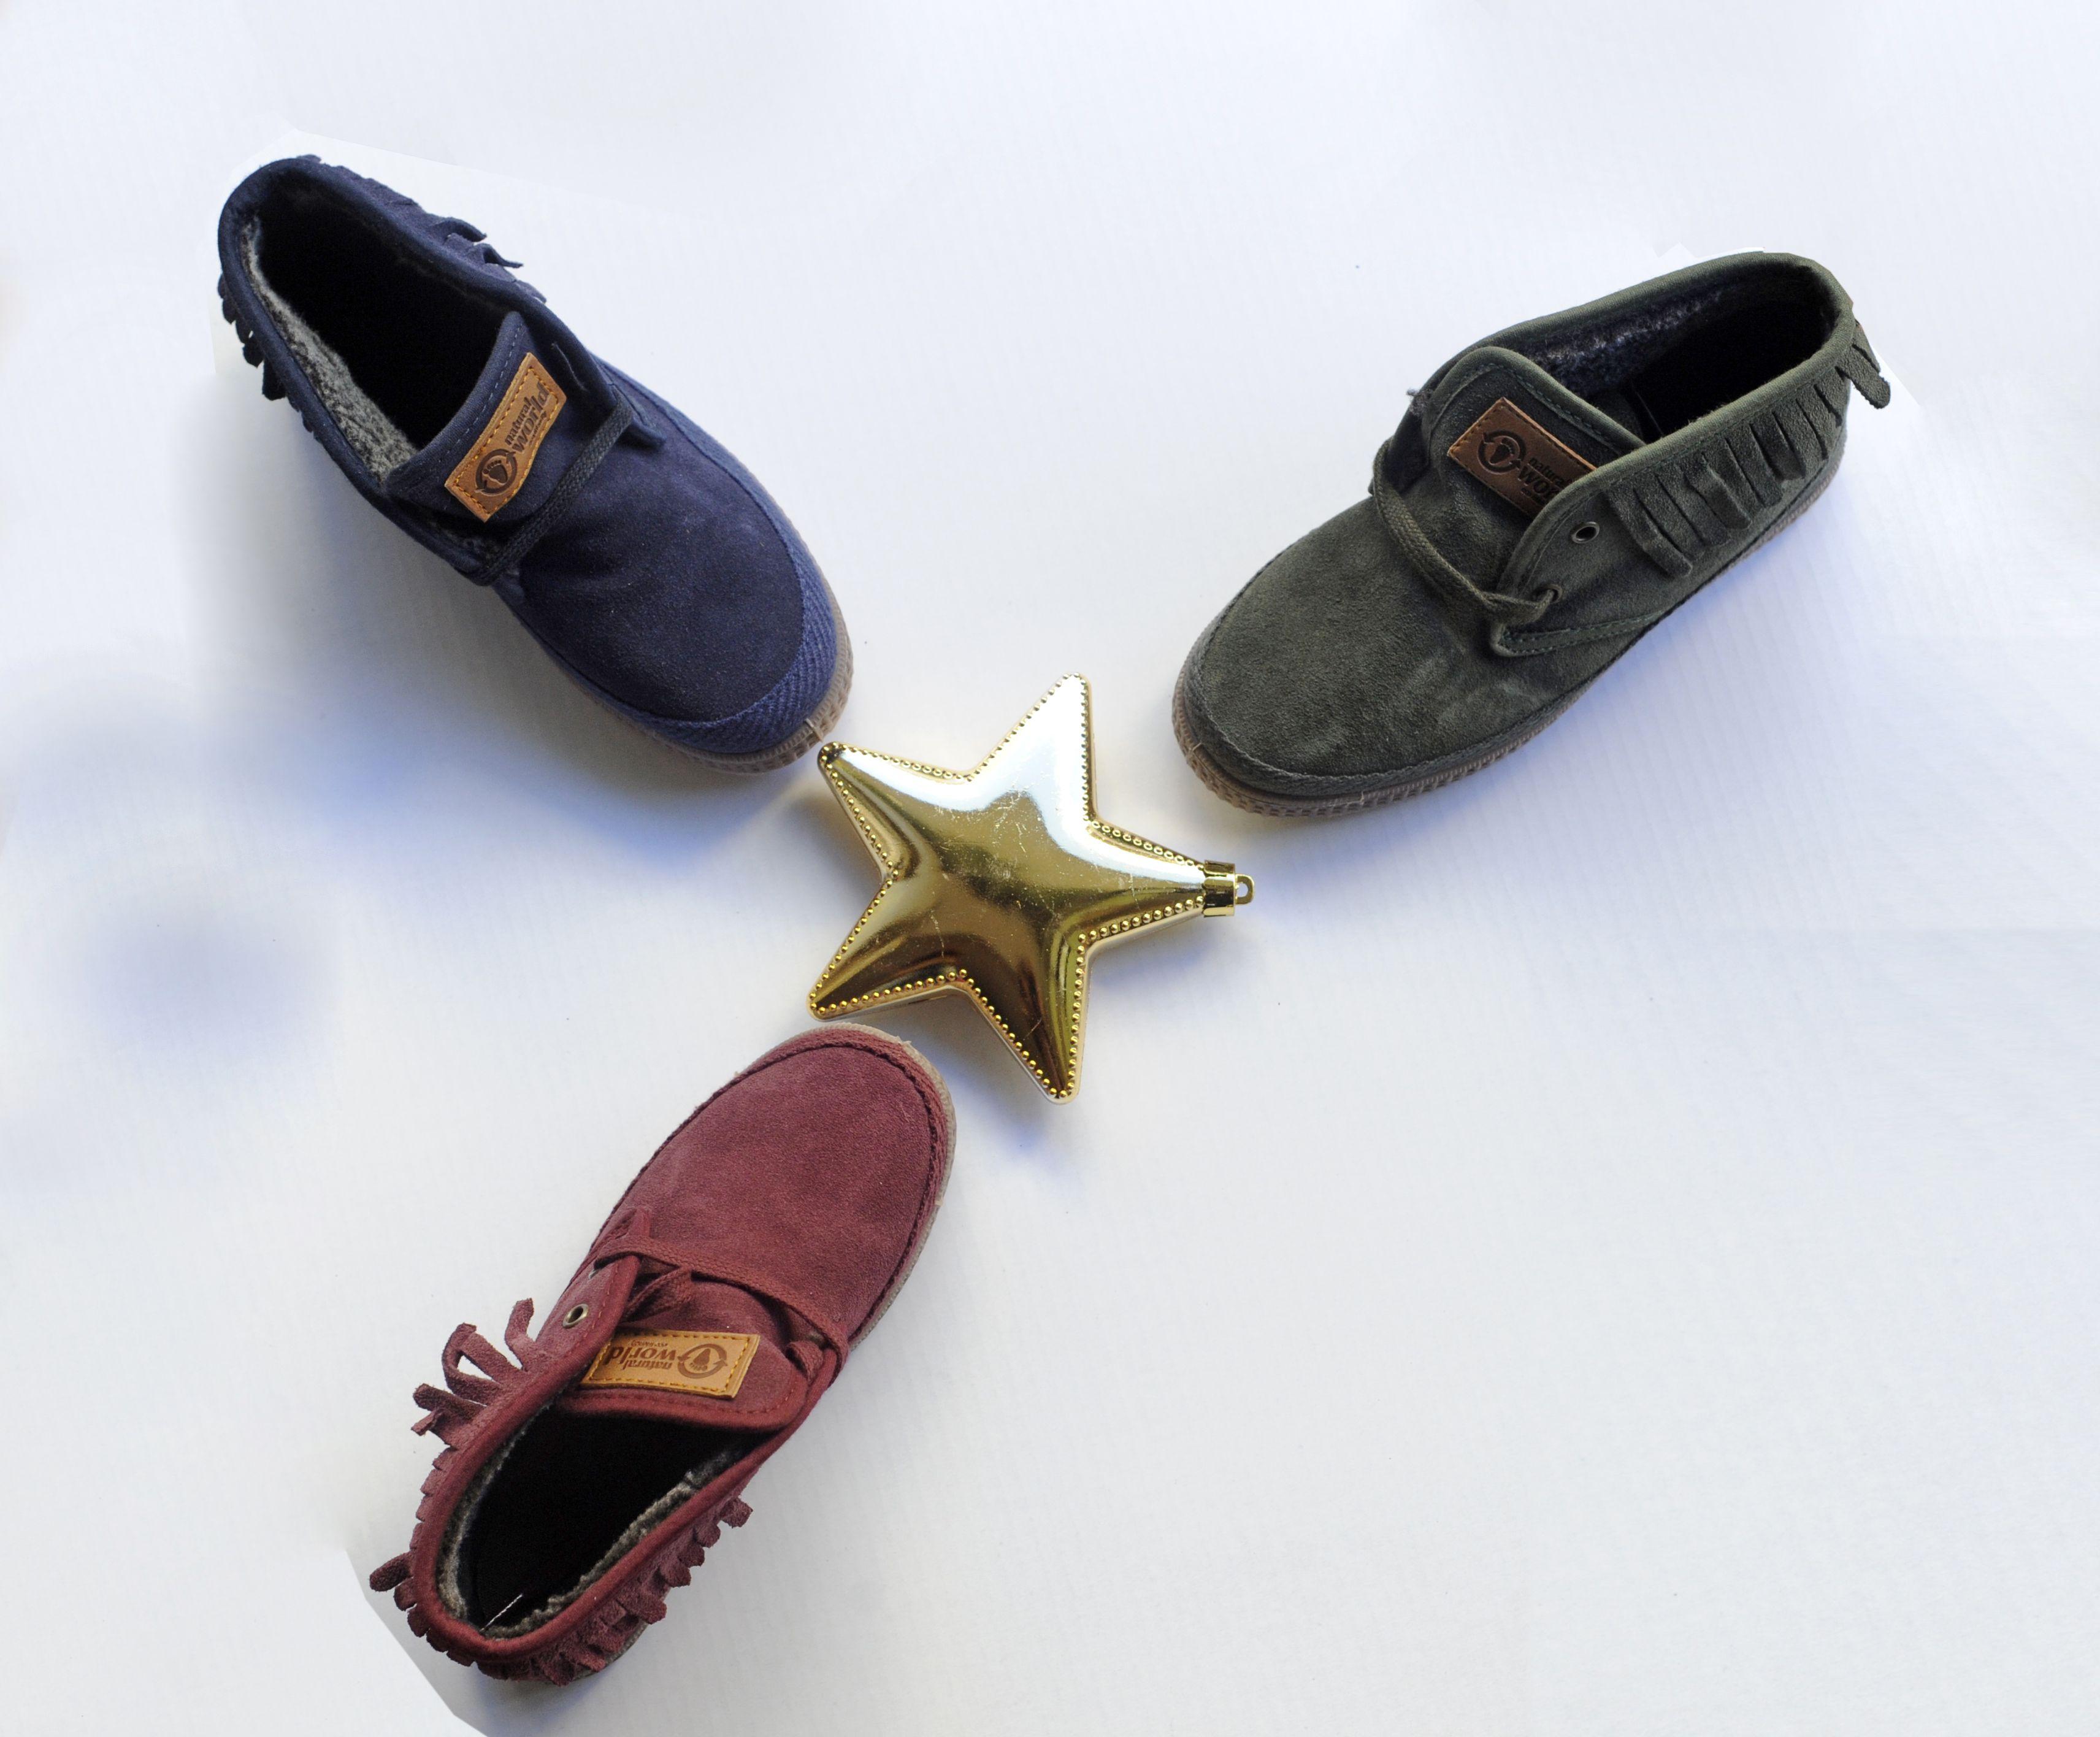 Calzado infantil con diseños diferentes